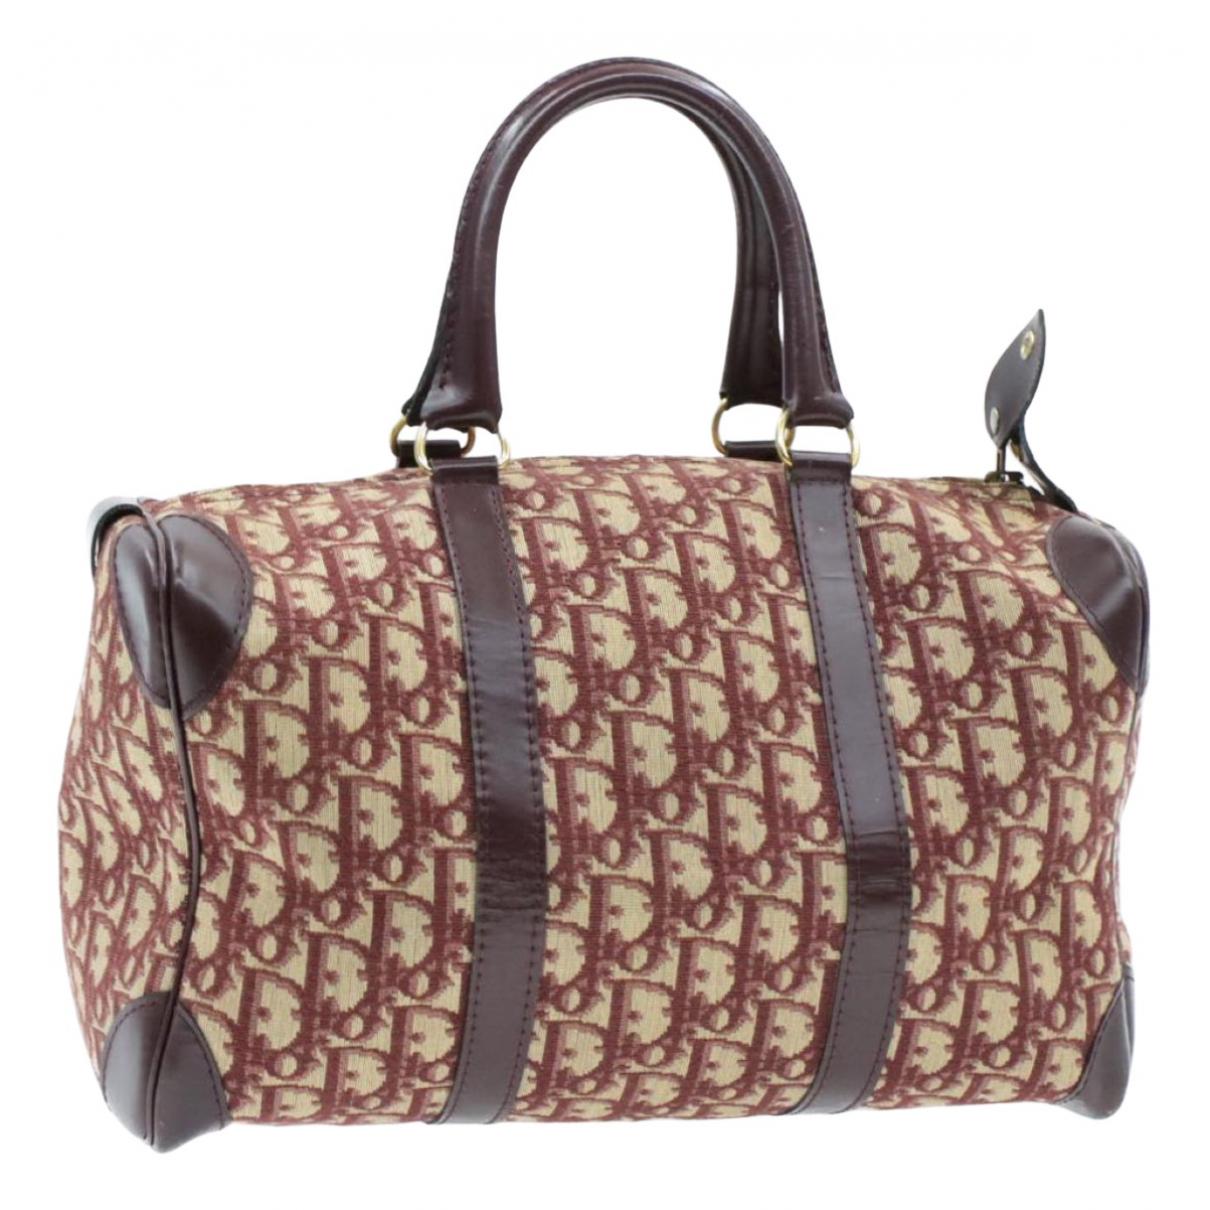 Dior Bowling Handtasche in  Bordeauxrot Leinen